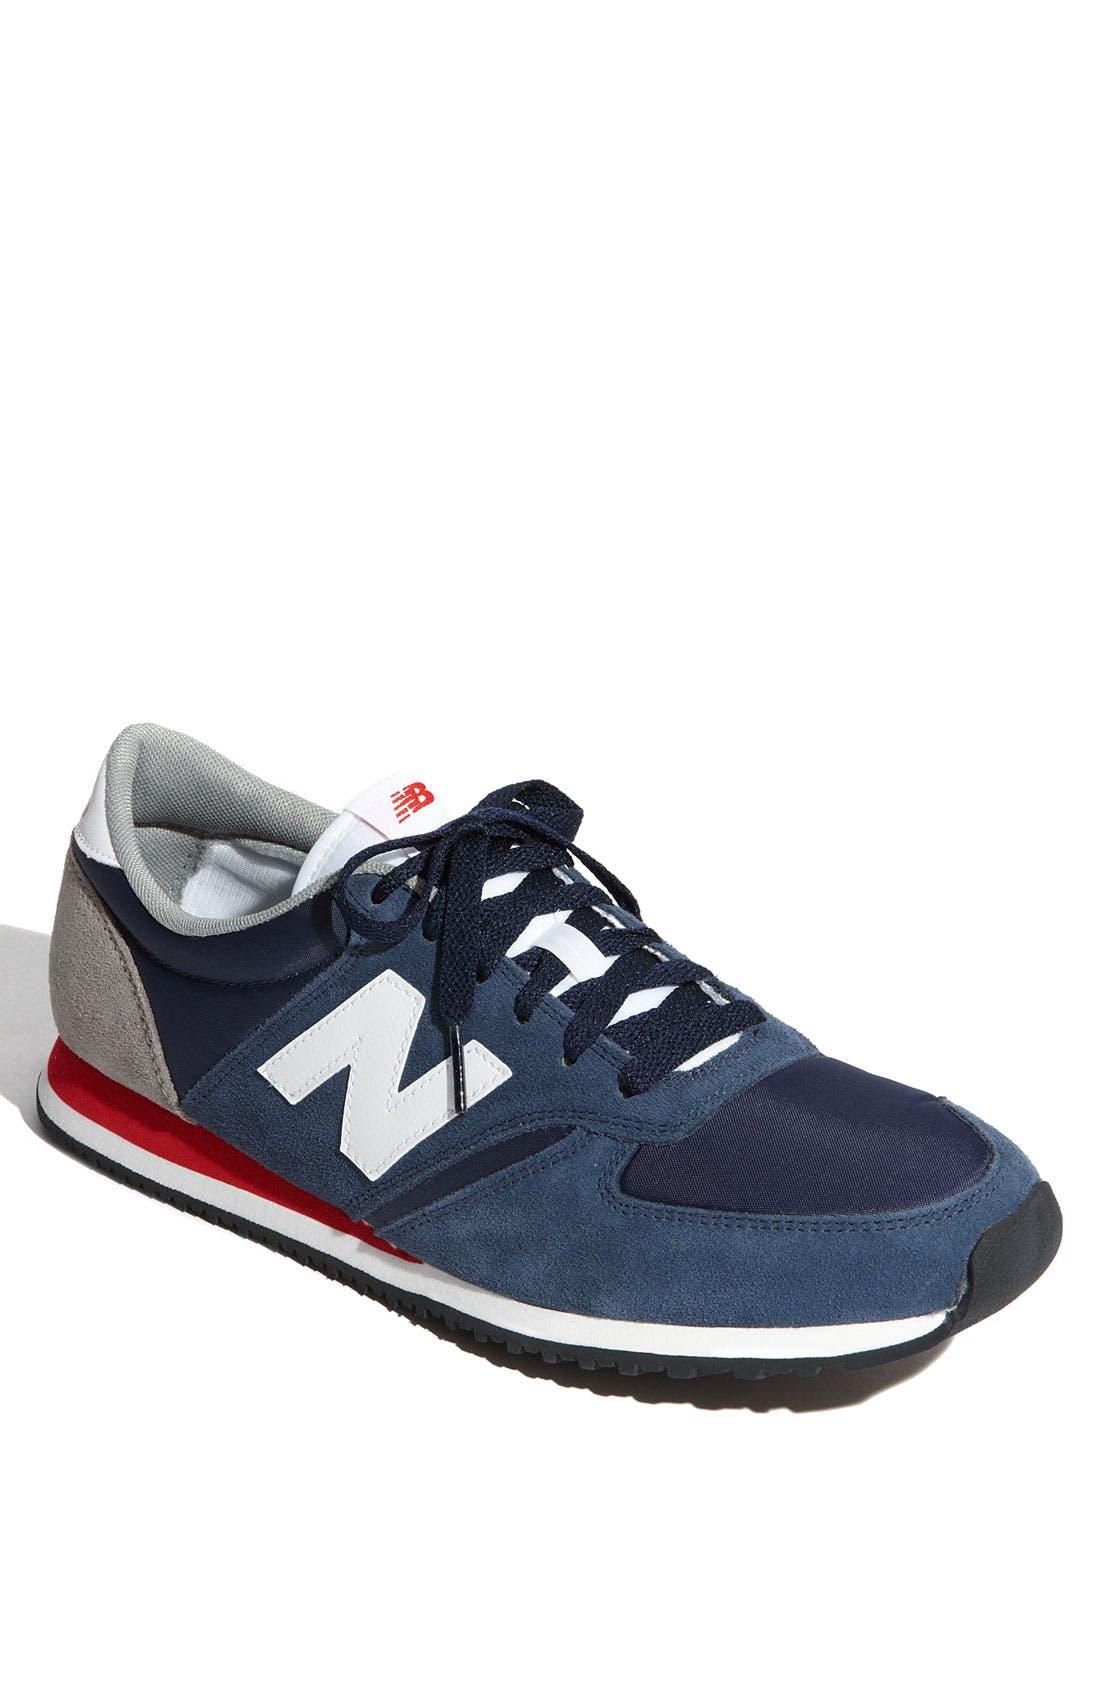 Main Image - New Balance '420' Sneaker